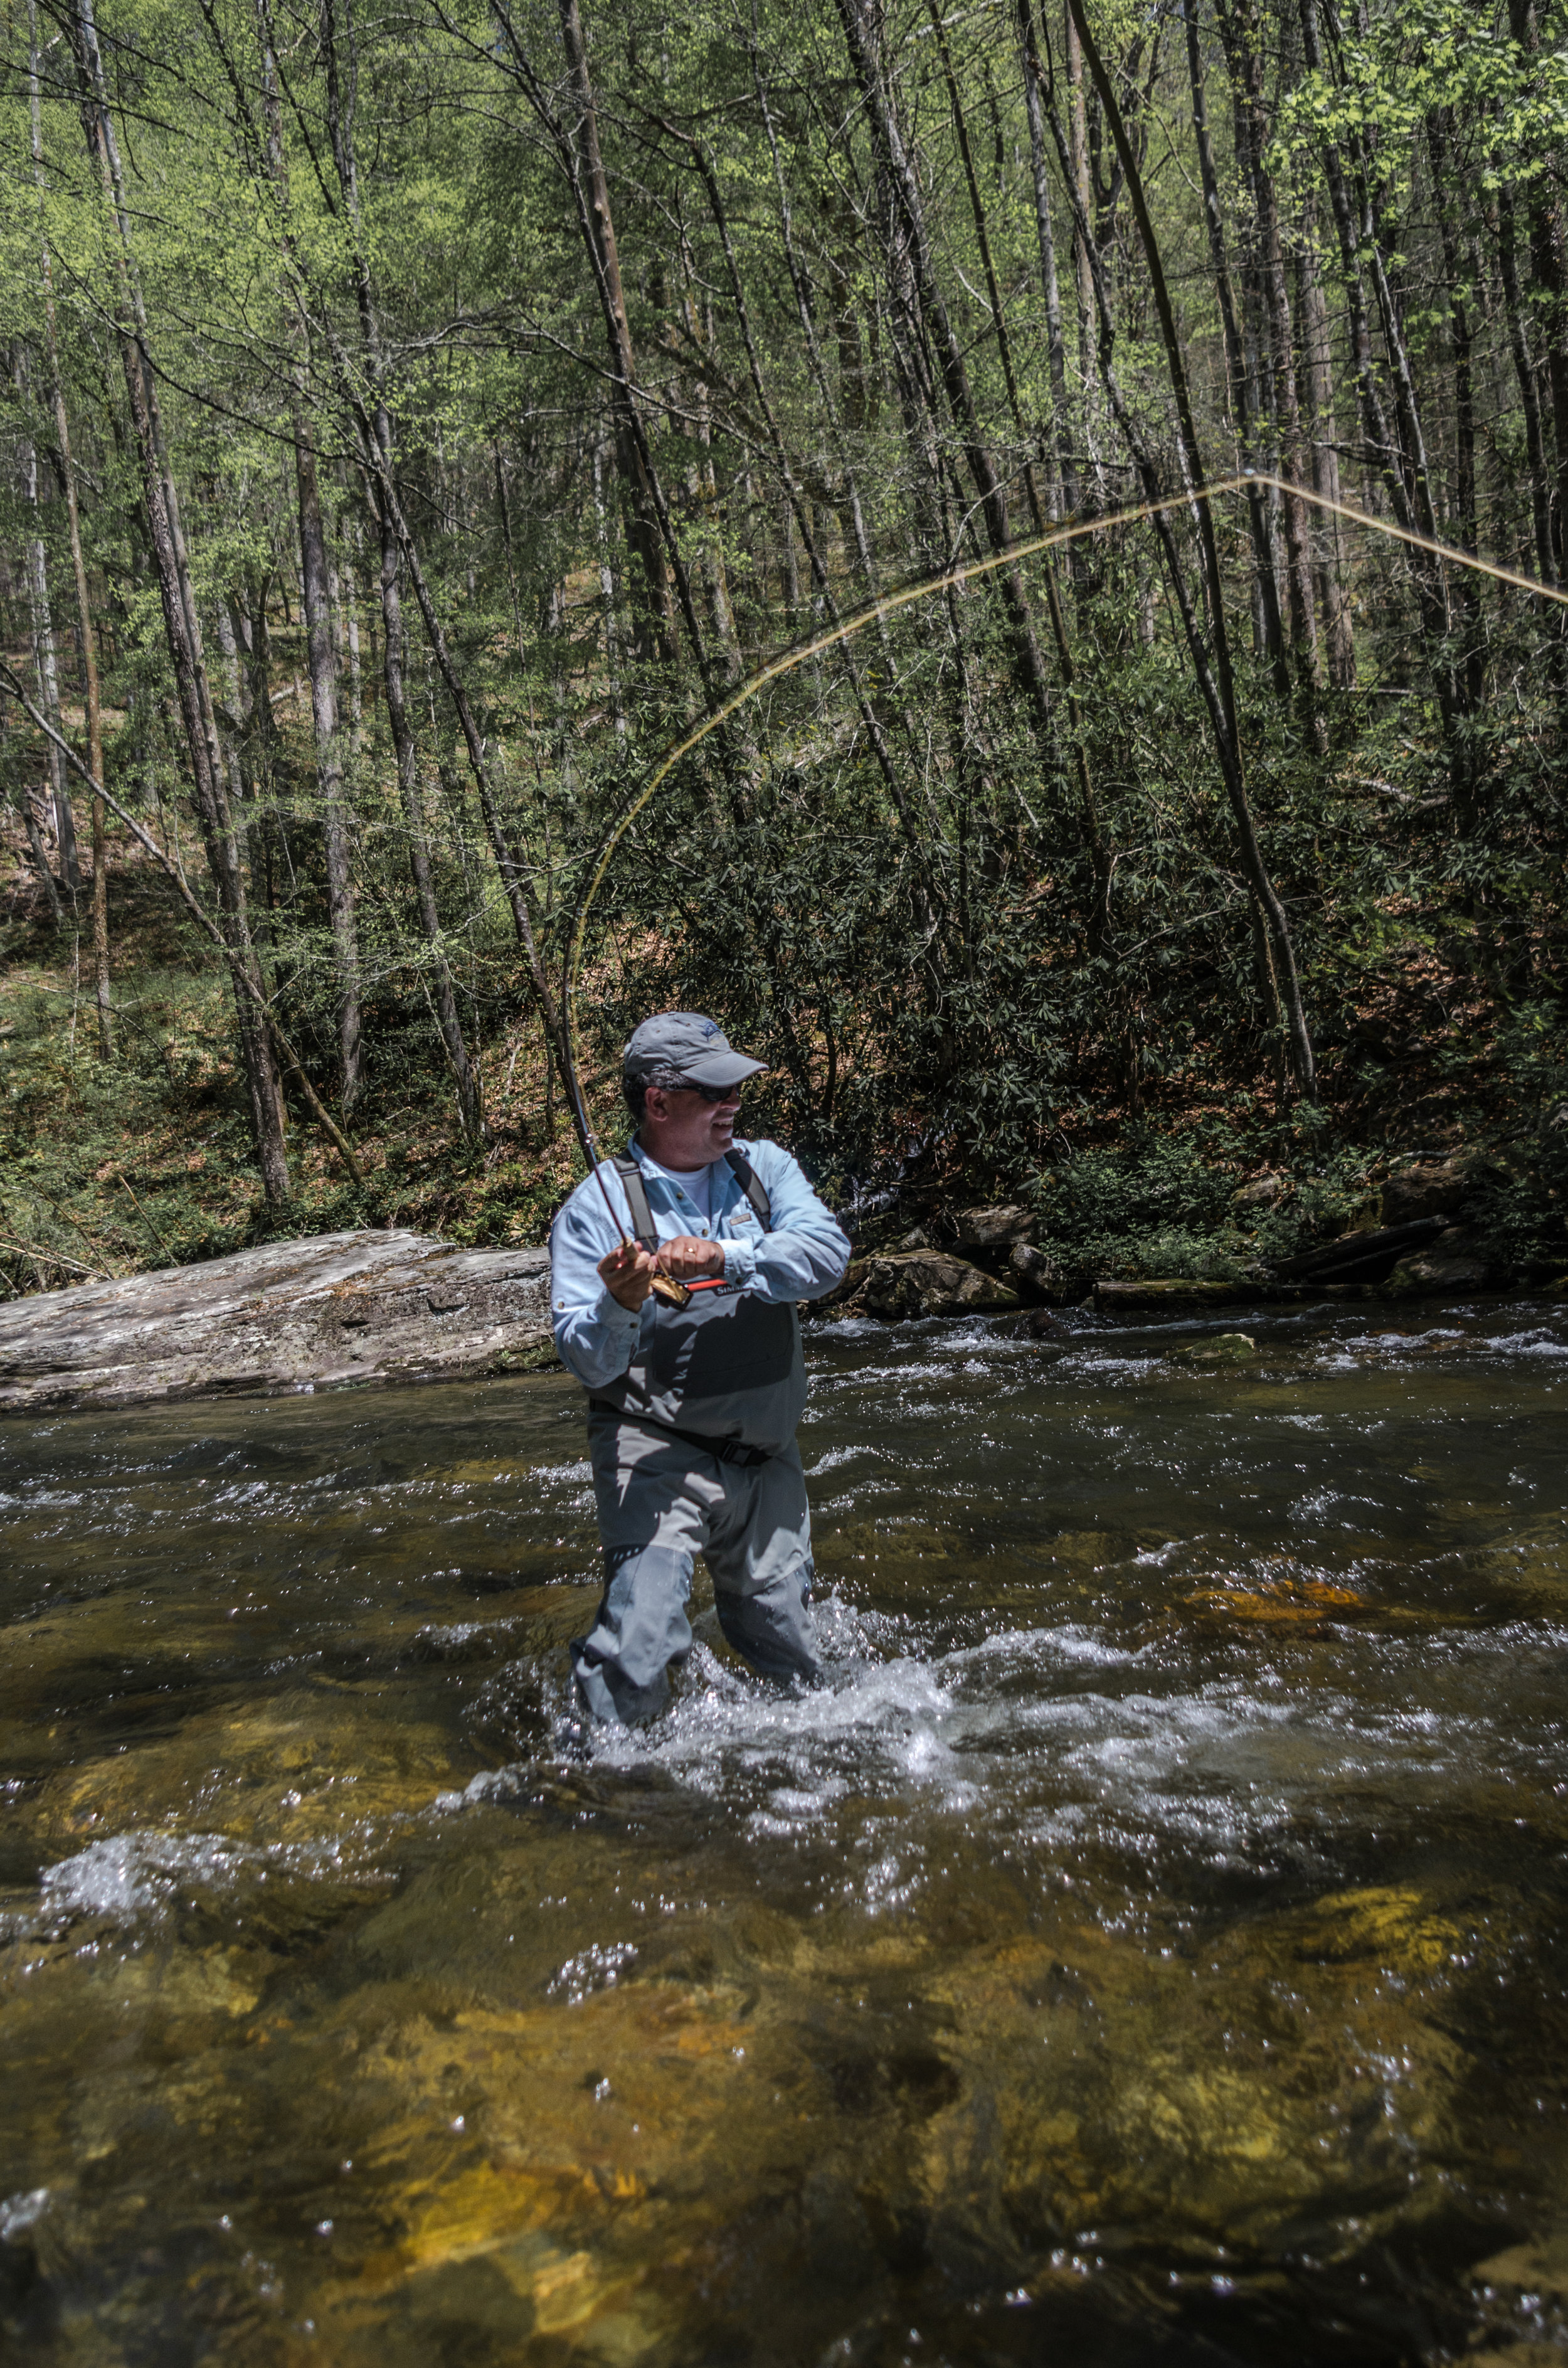 Fly Fisherman Fighting Fish Davidson River.jpg